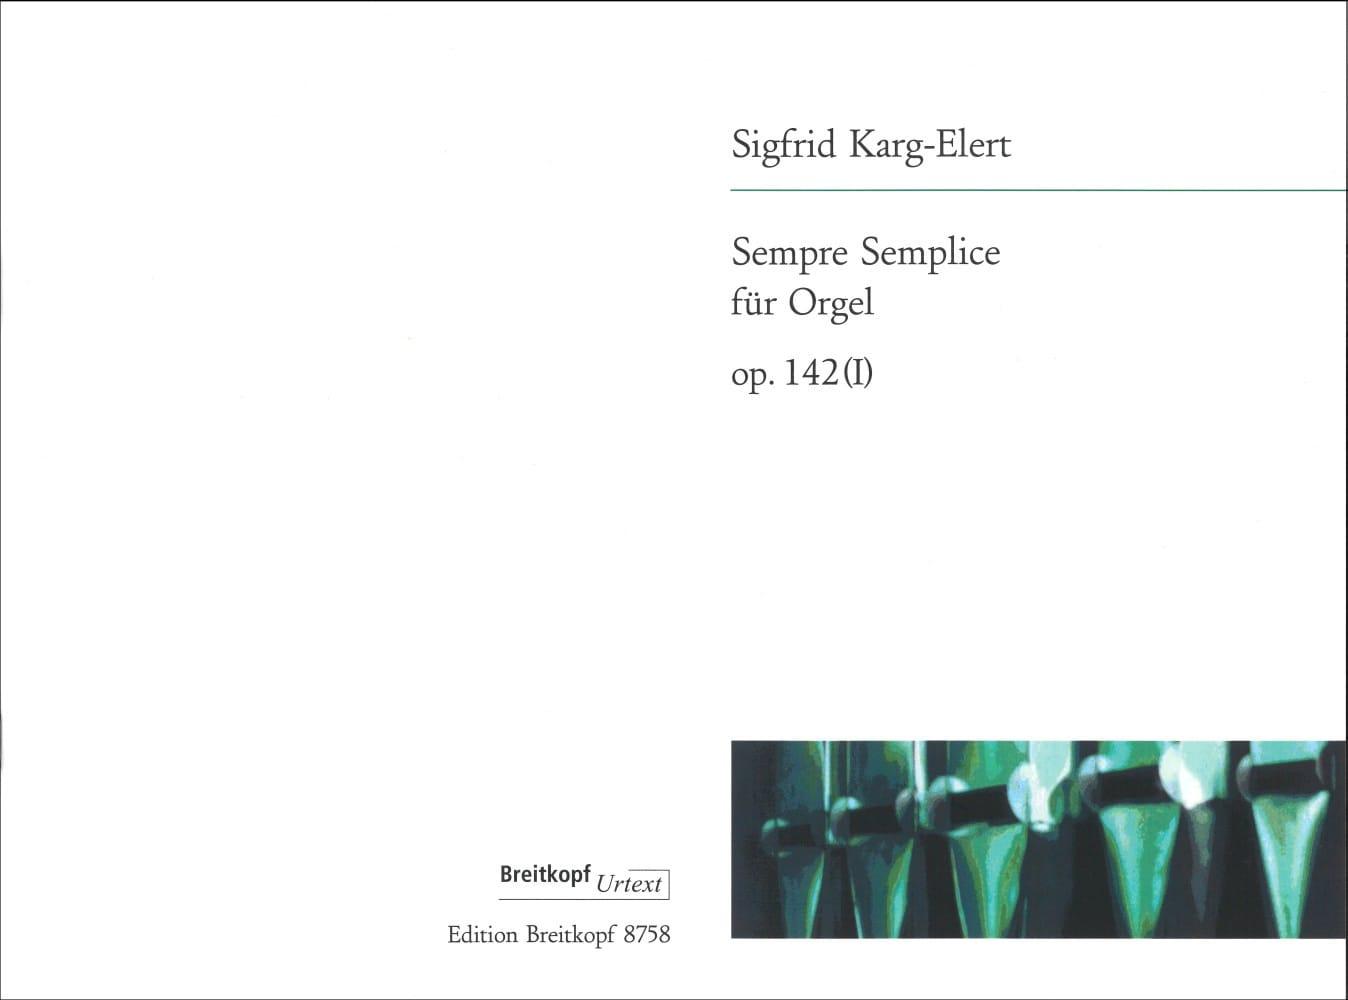 Sempre Semplice Op. 142-1 - Sigfrid Karg-Elert - laflutedepan.com